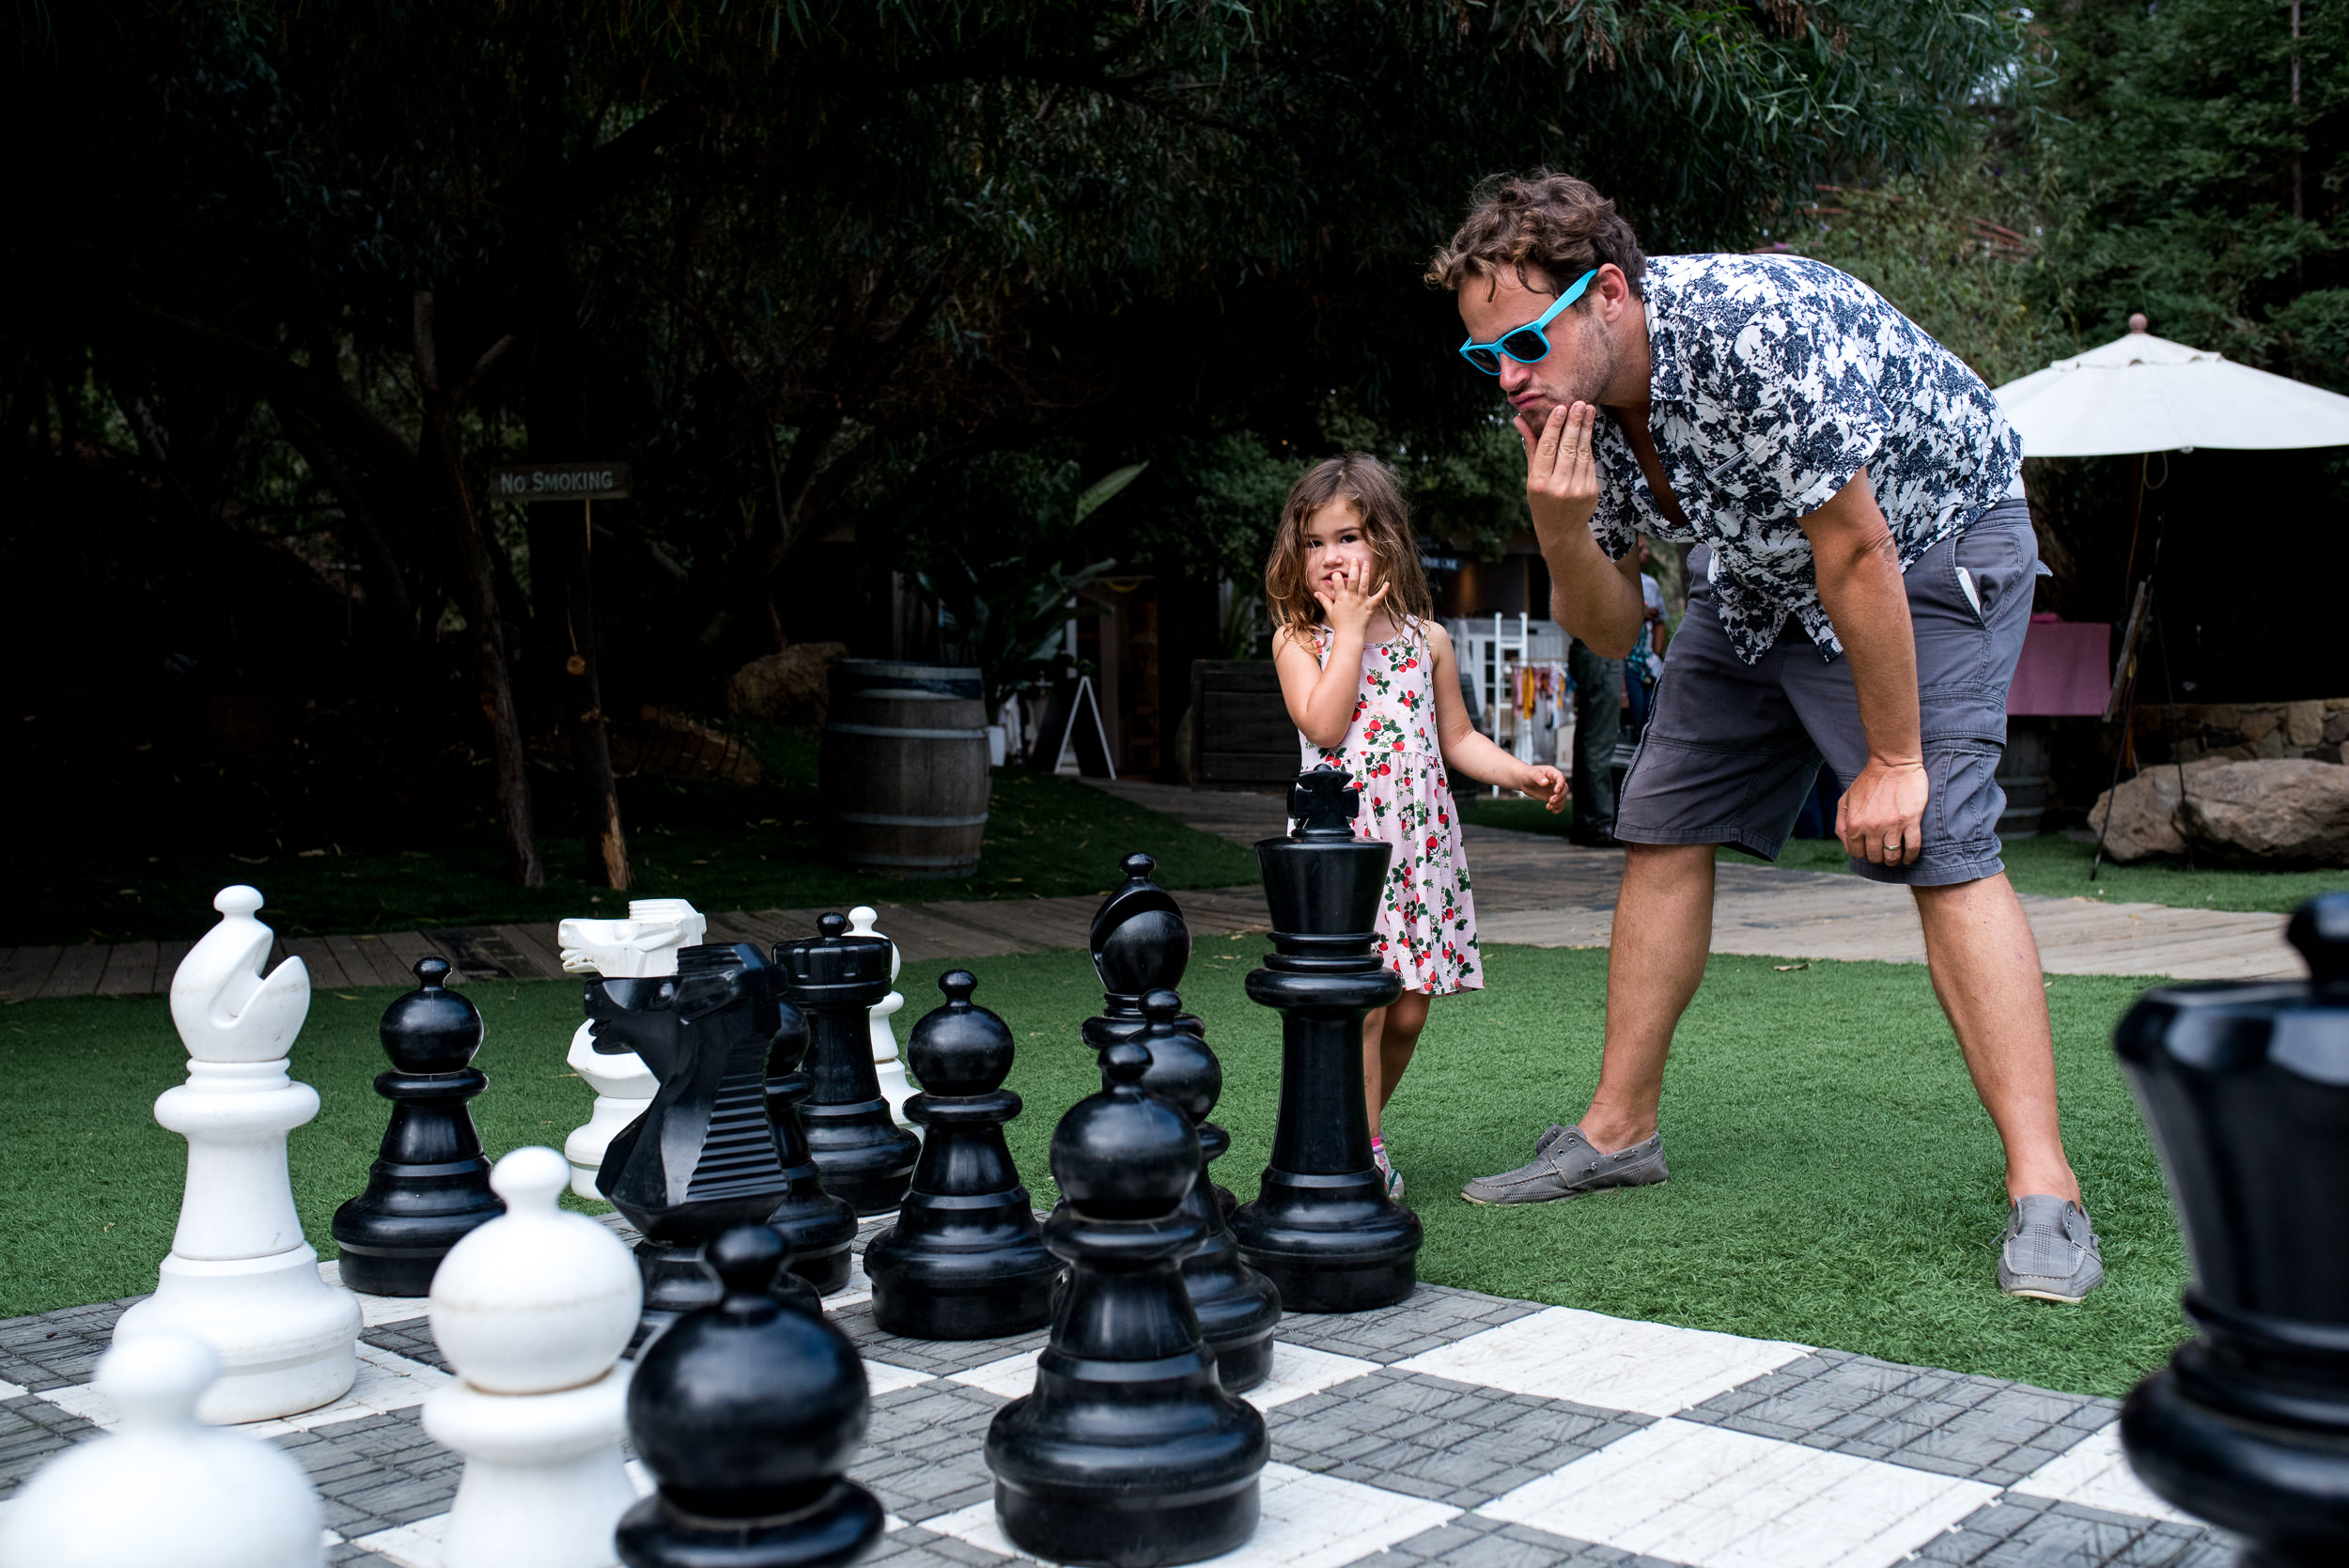 Deborah-Barak-Documentary-Family-Photography-Brooklyn_NYC_girl-and-dad-play-chess.jpg